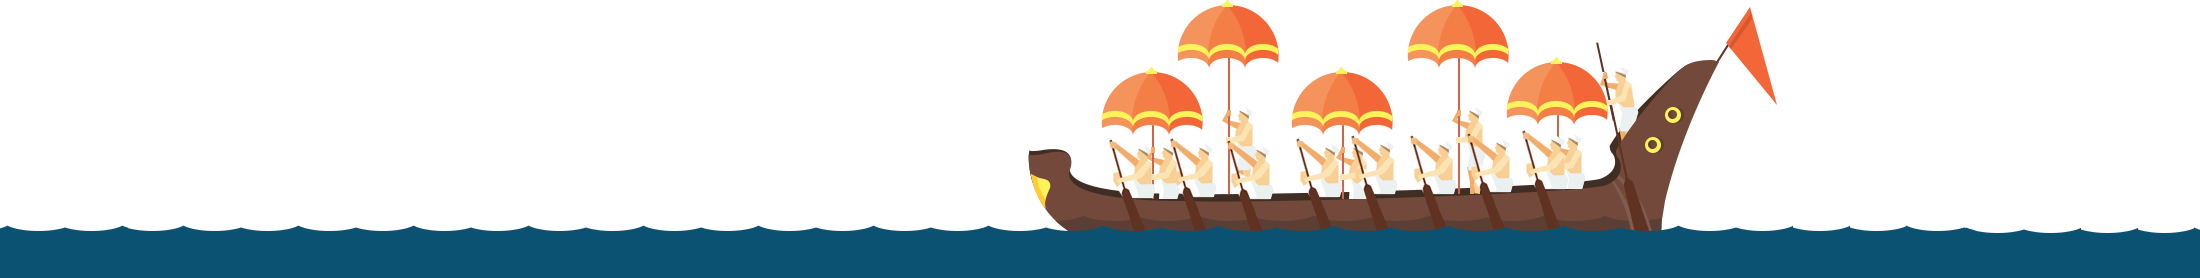 Onam Boat PNG - 77215